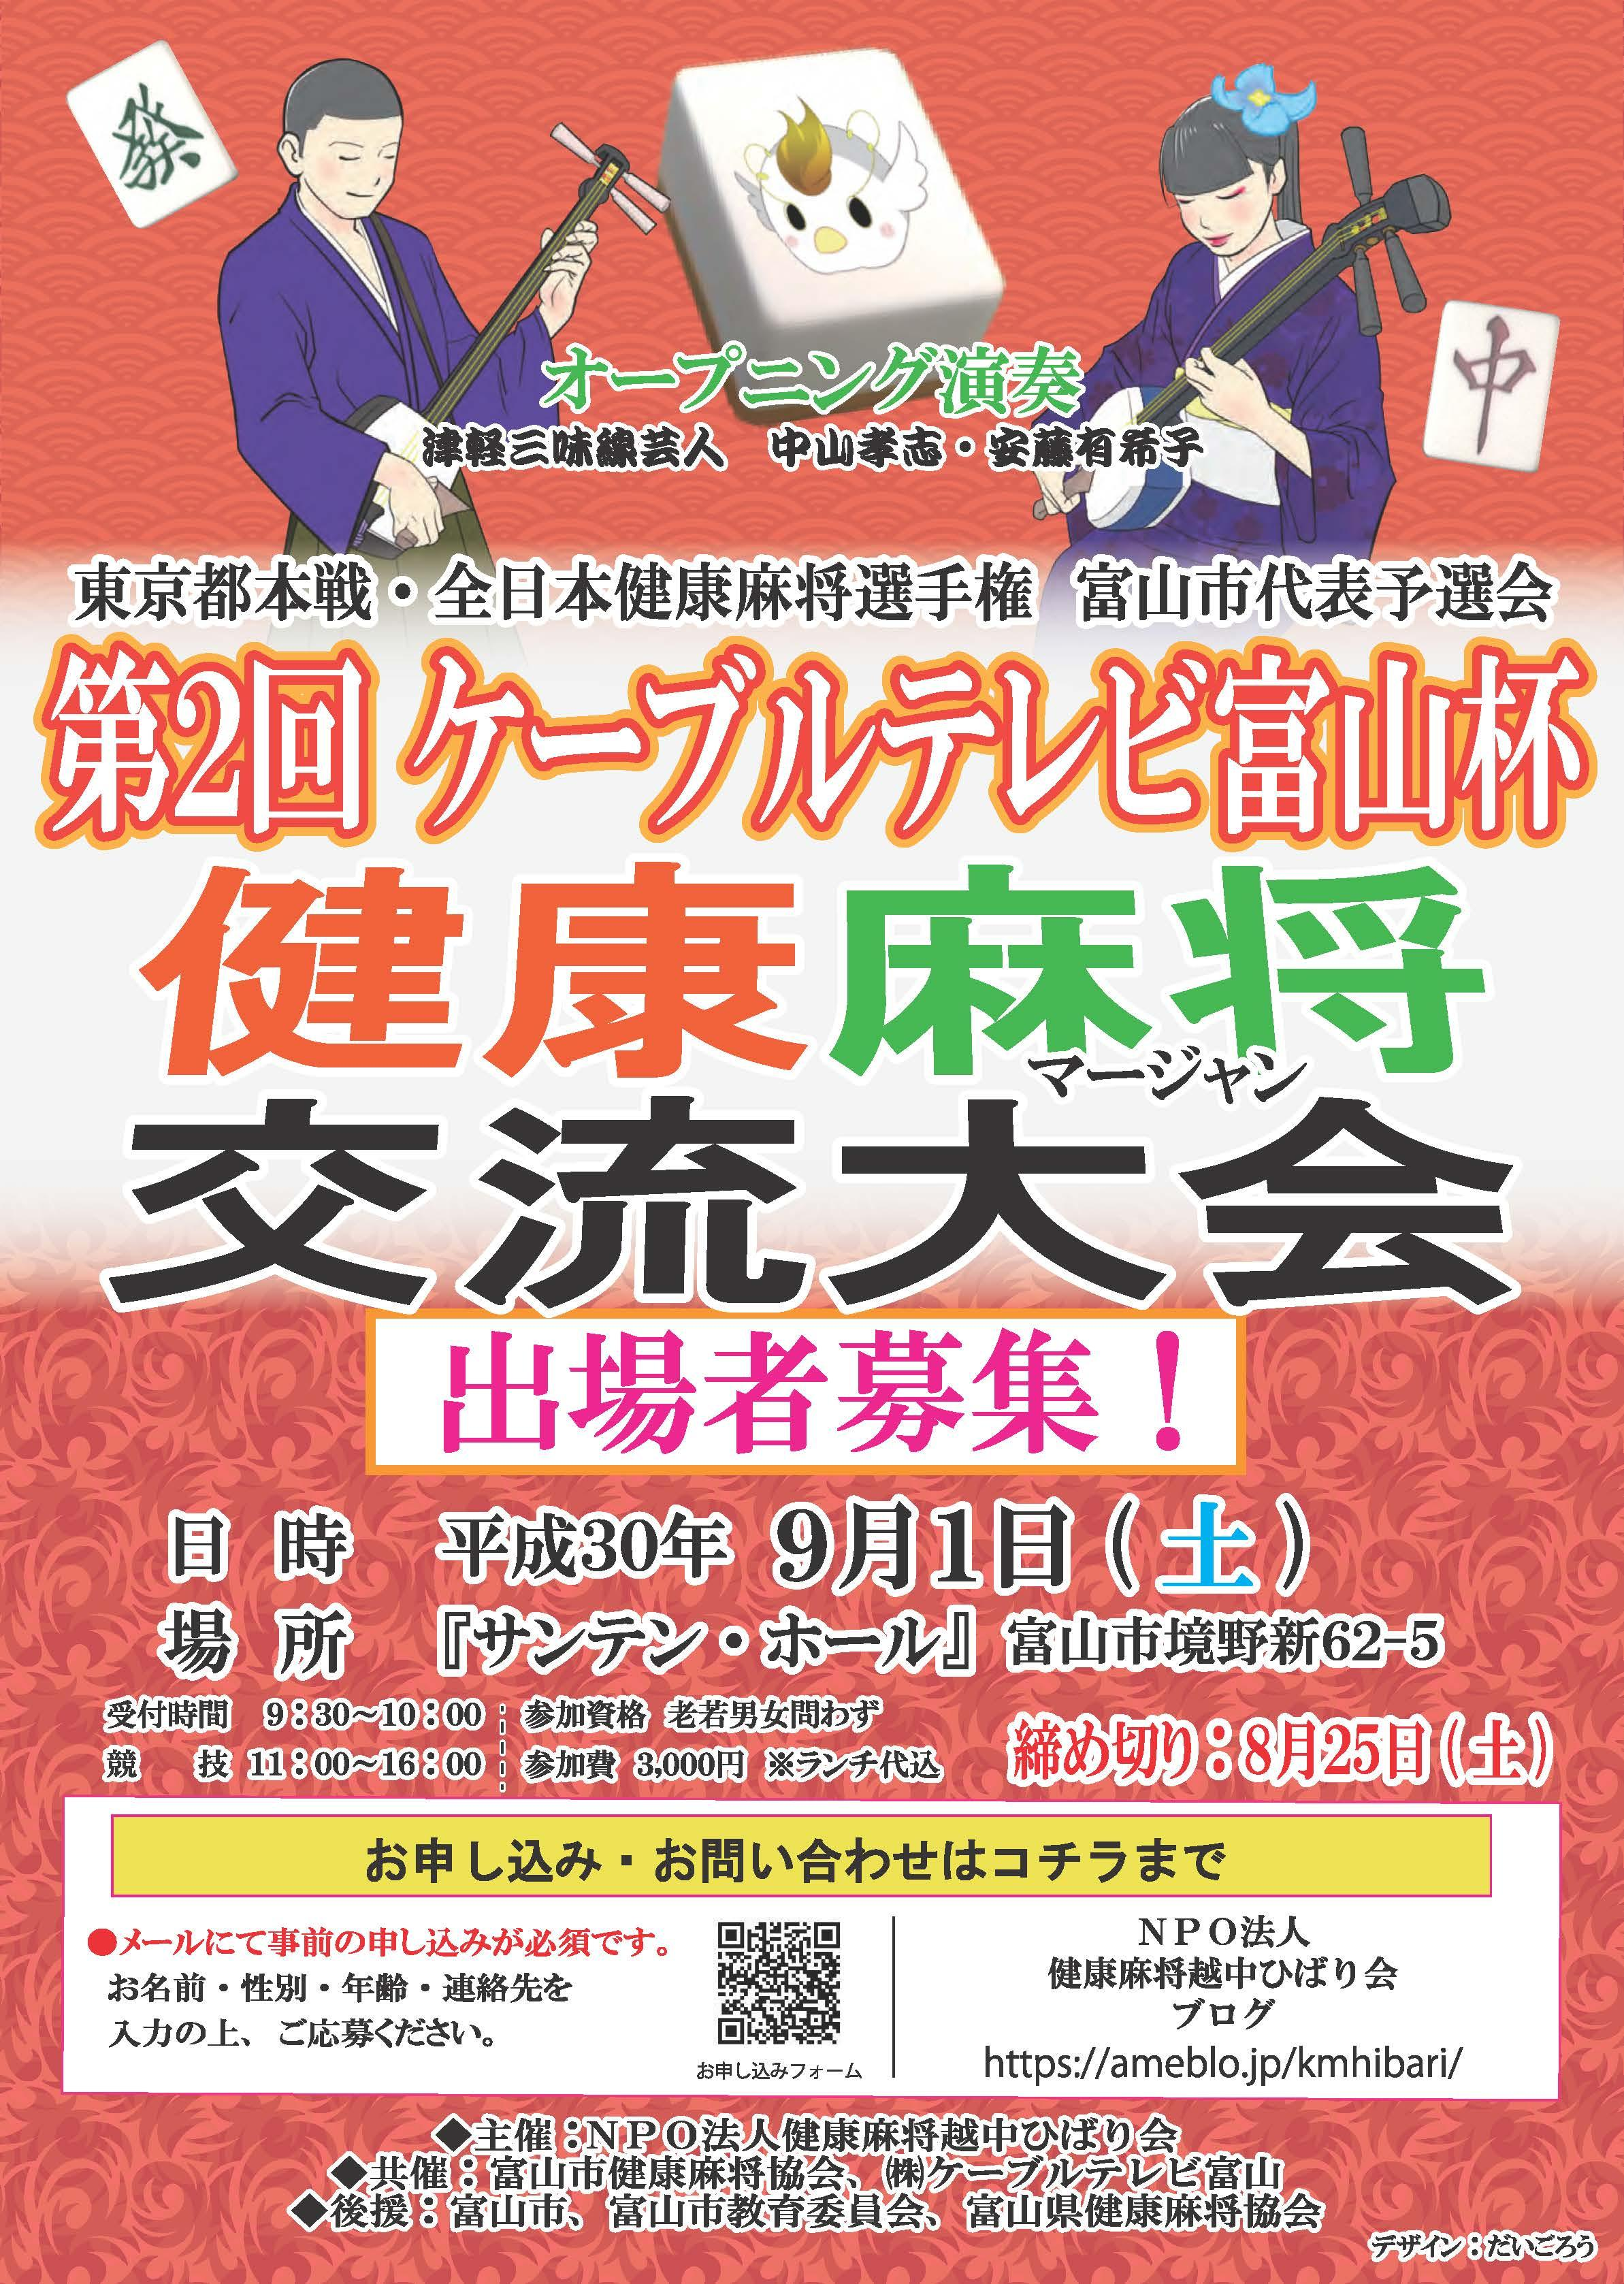 http://ctt.ne.jp/news/f5bc226bf50f7b8958e6545813fa5ce0717011c6.jpg